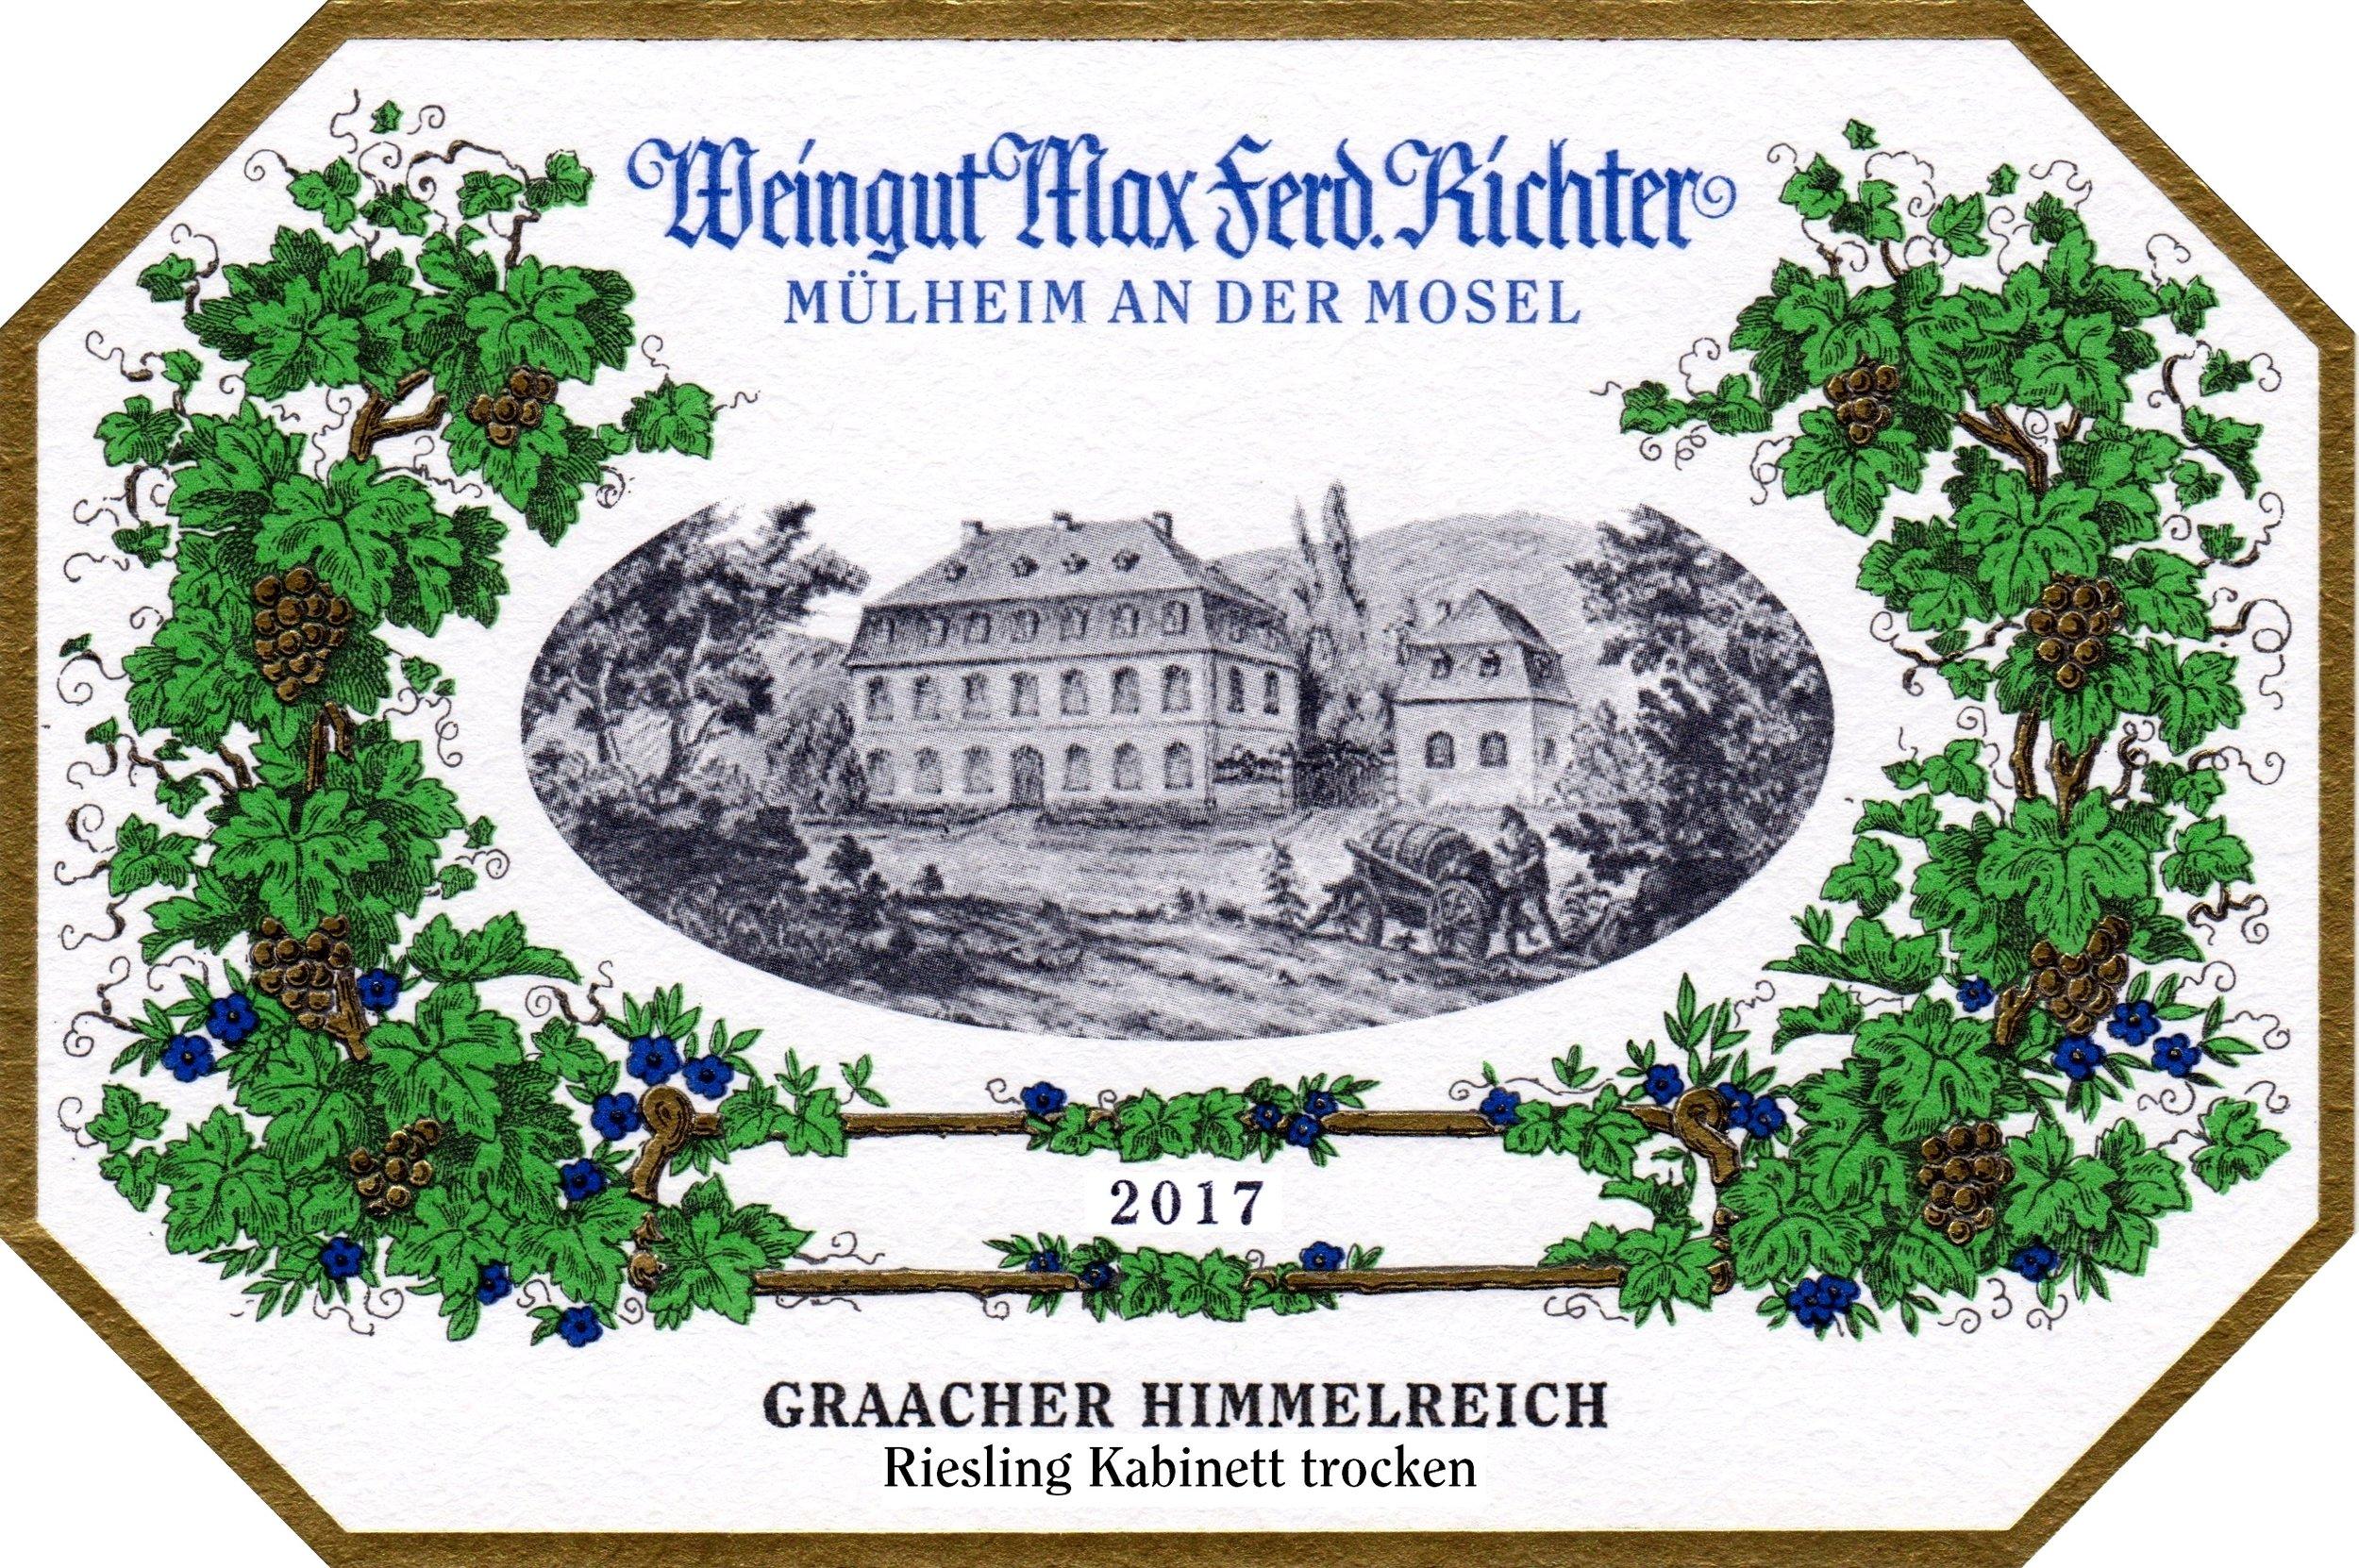 2017 Graacher Himmelreich Kabinett trocken.jpg